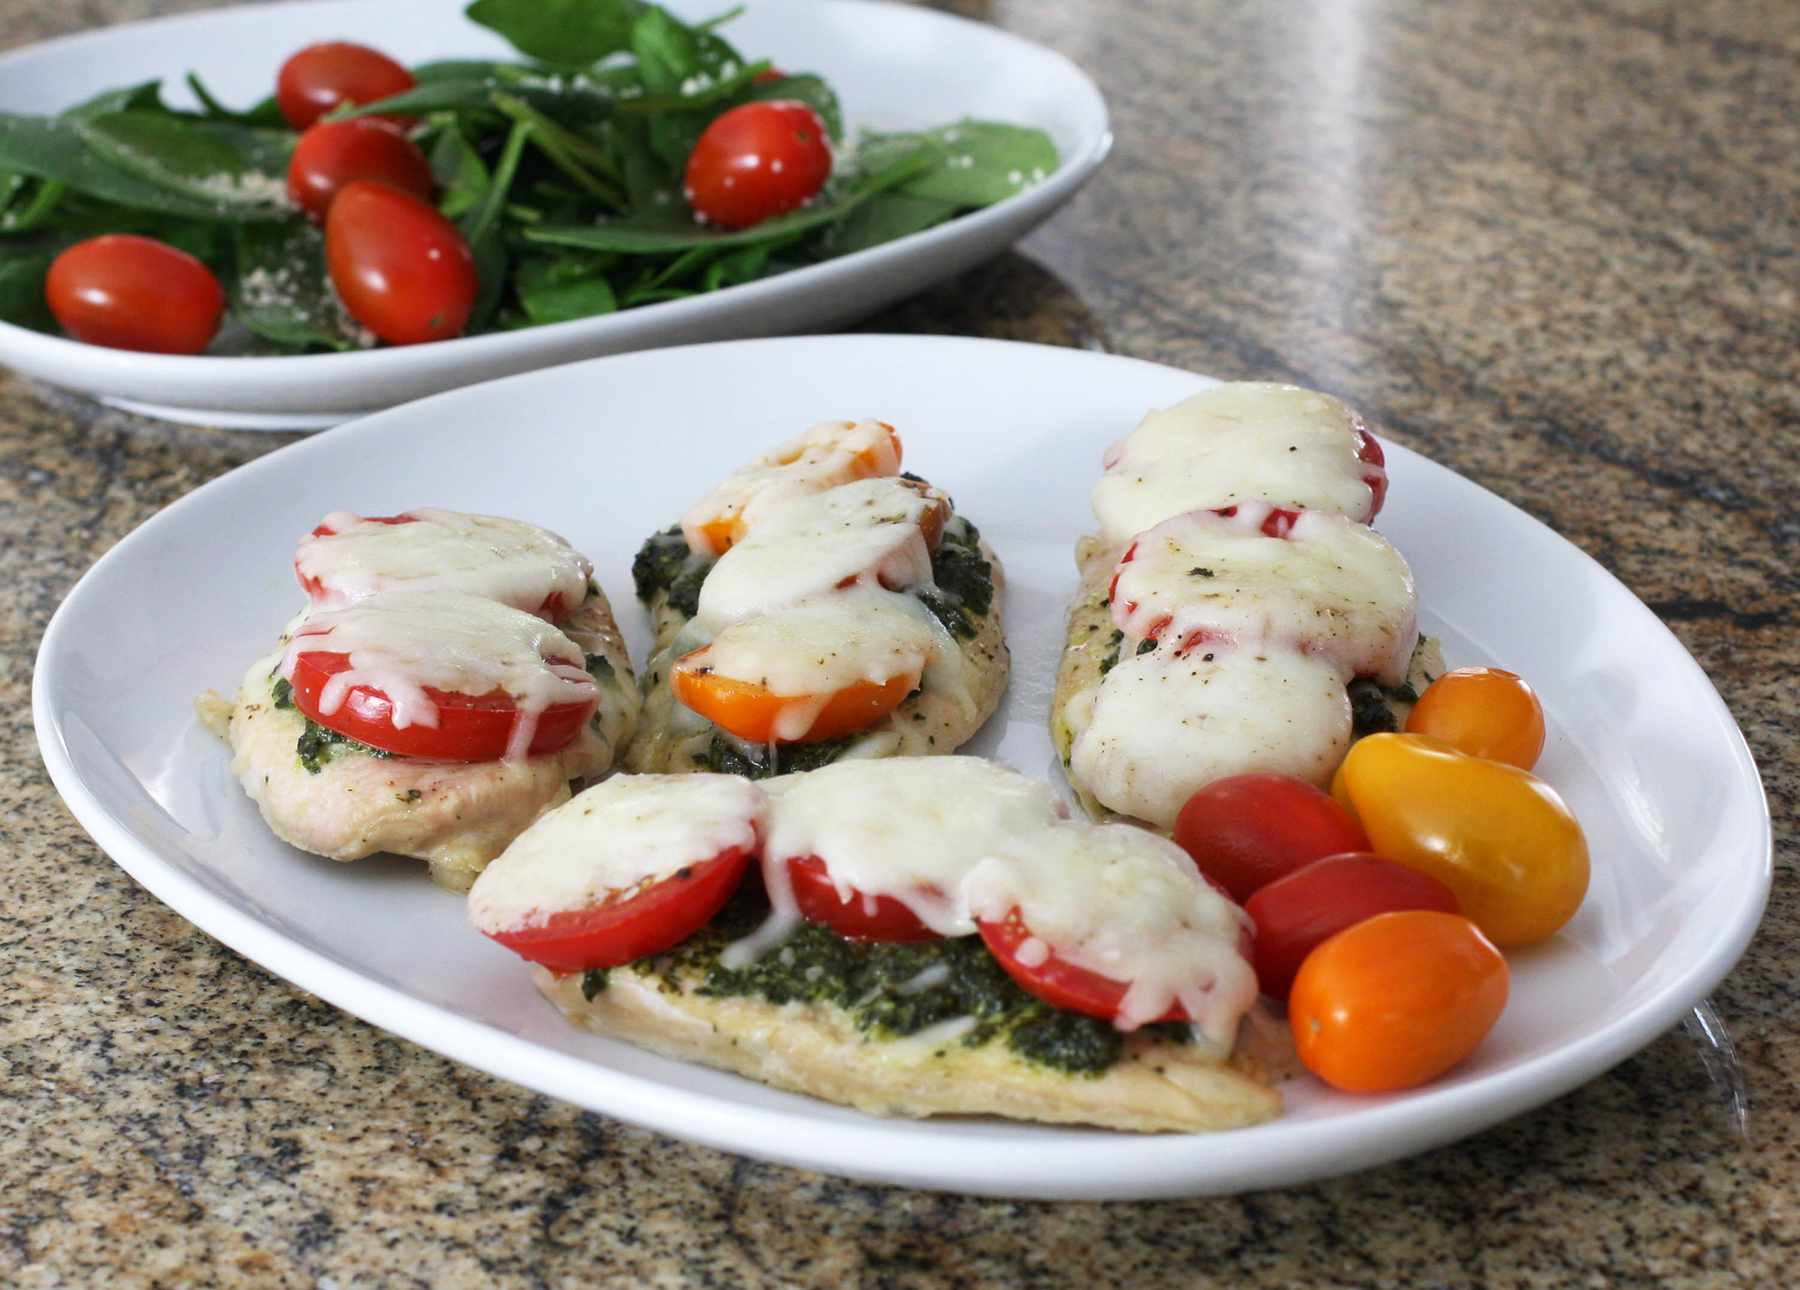 Baked Chicken Recipe With Pesto, Tomatoes, and Mozzarella